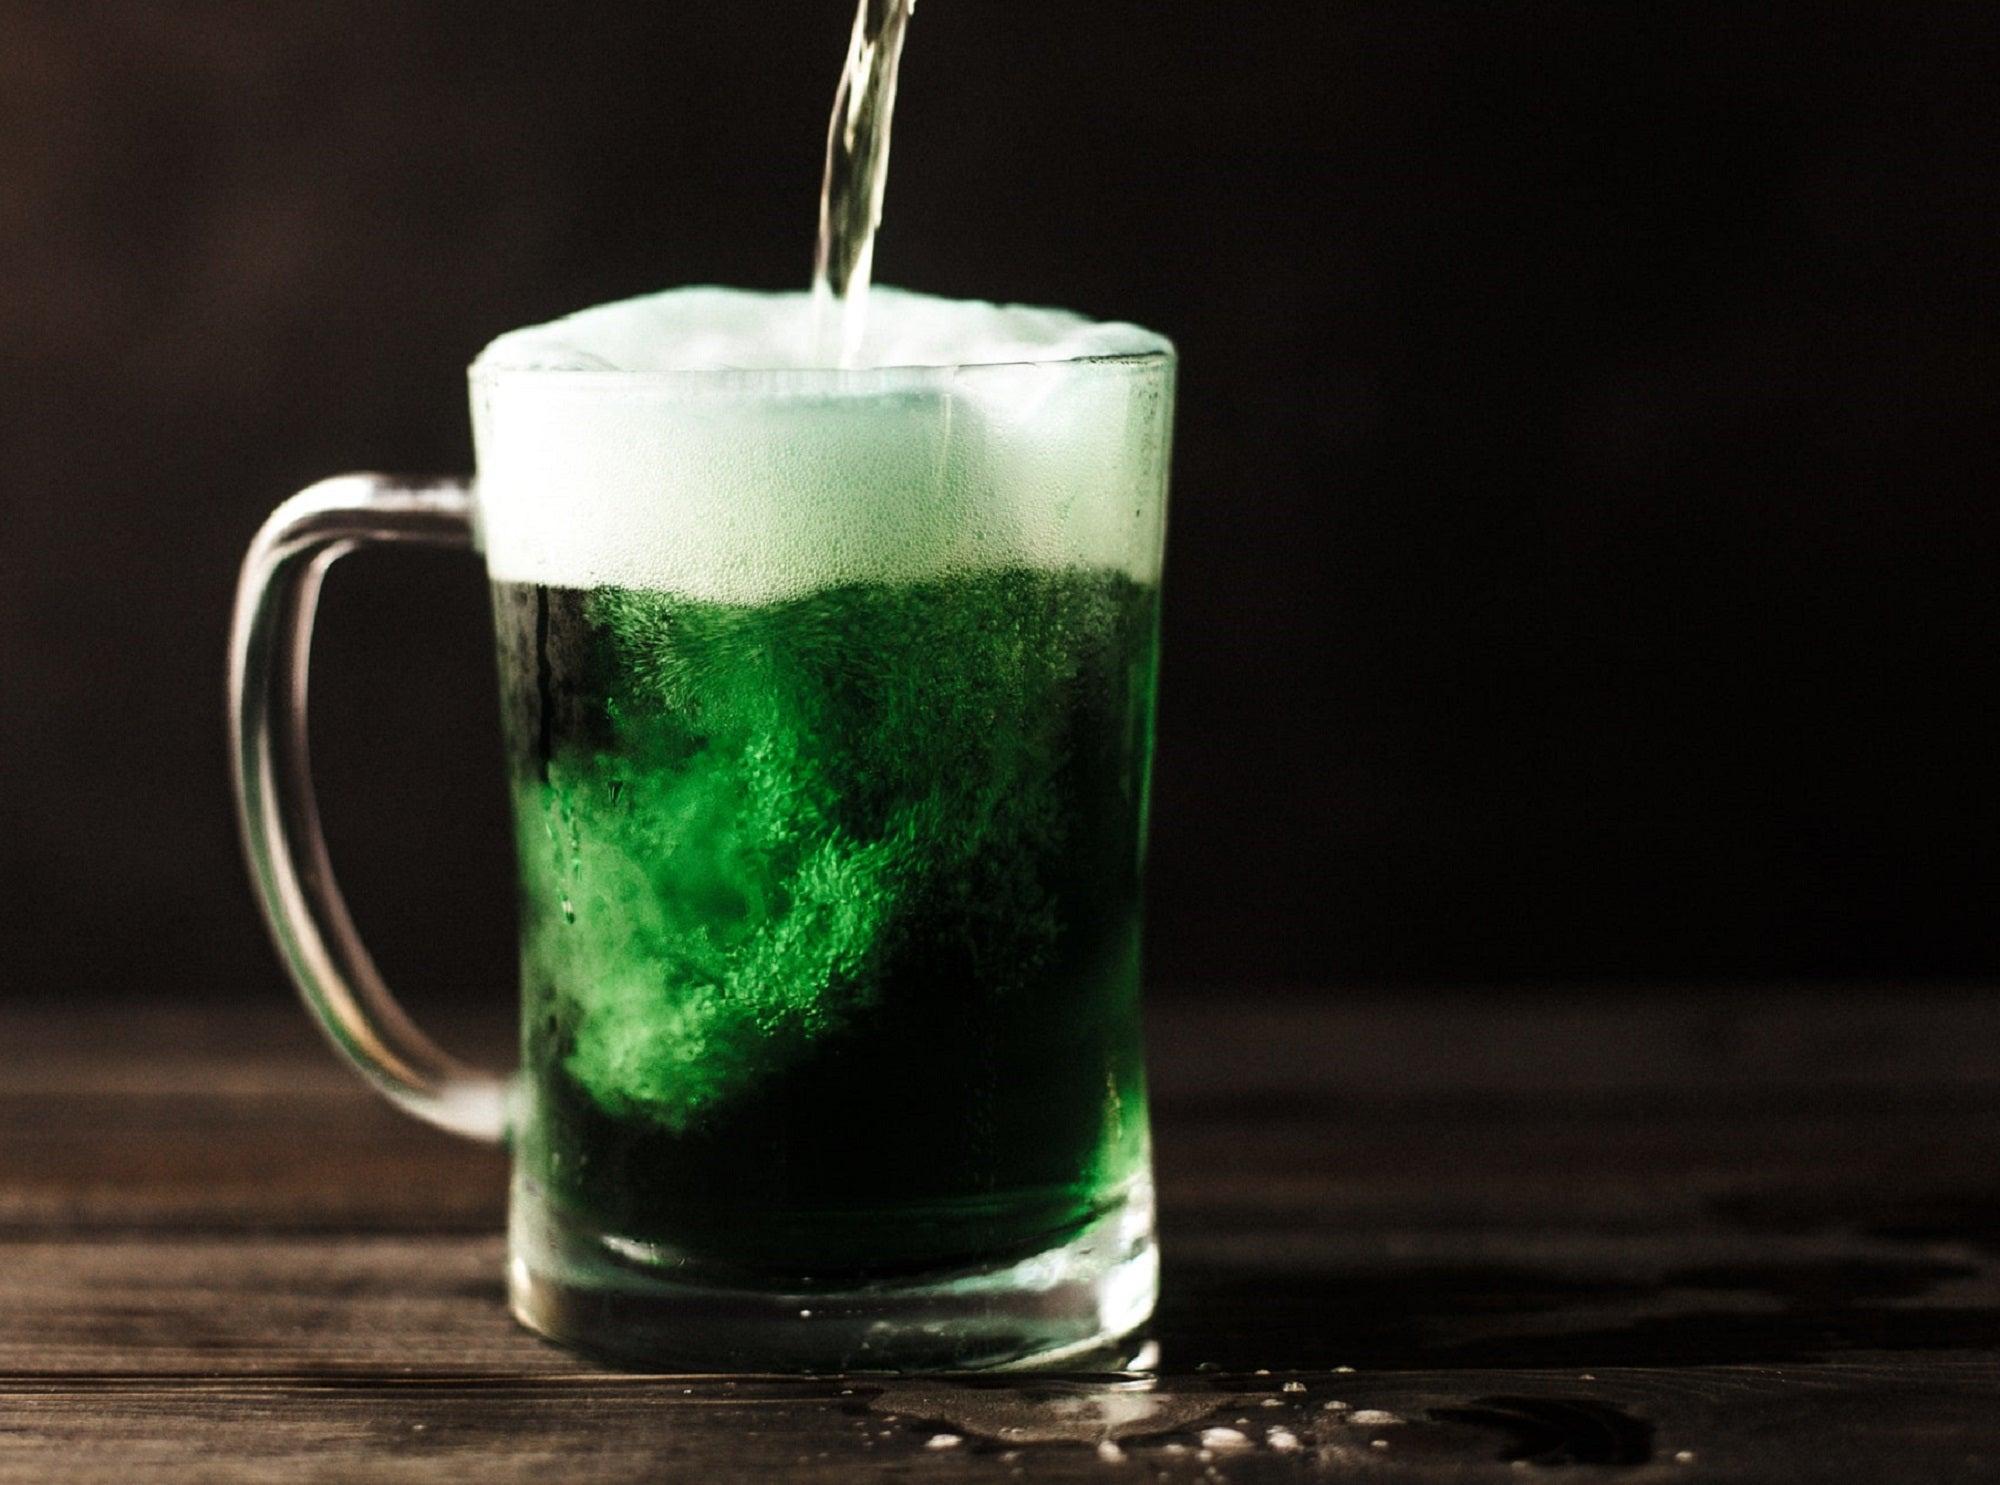 Mug of green beer being poured